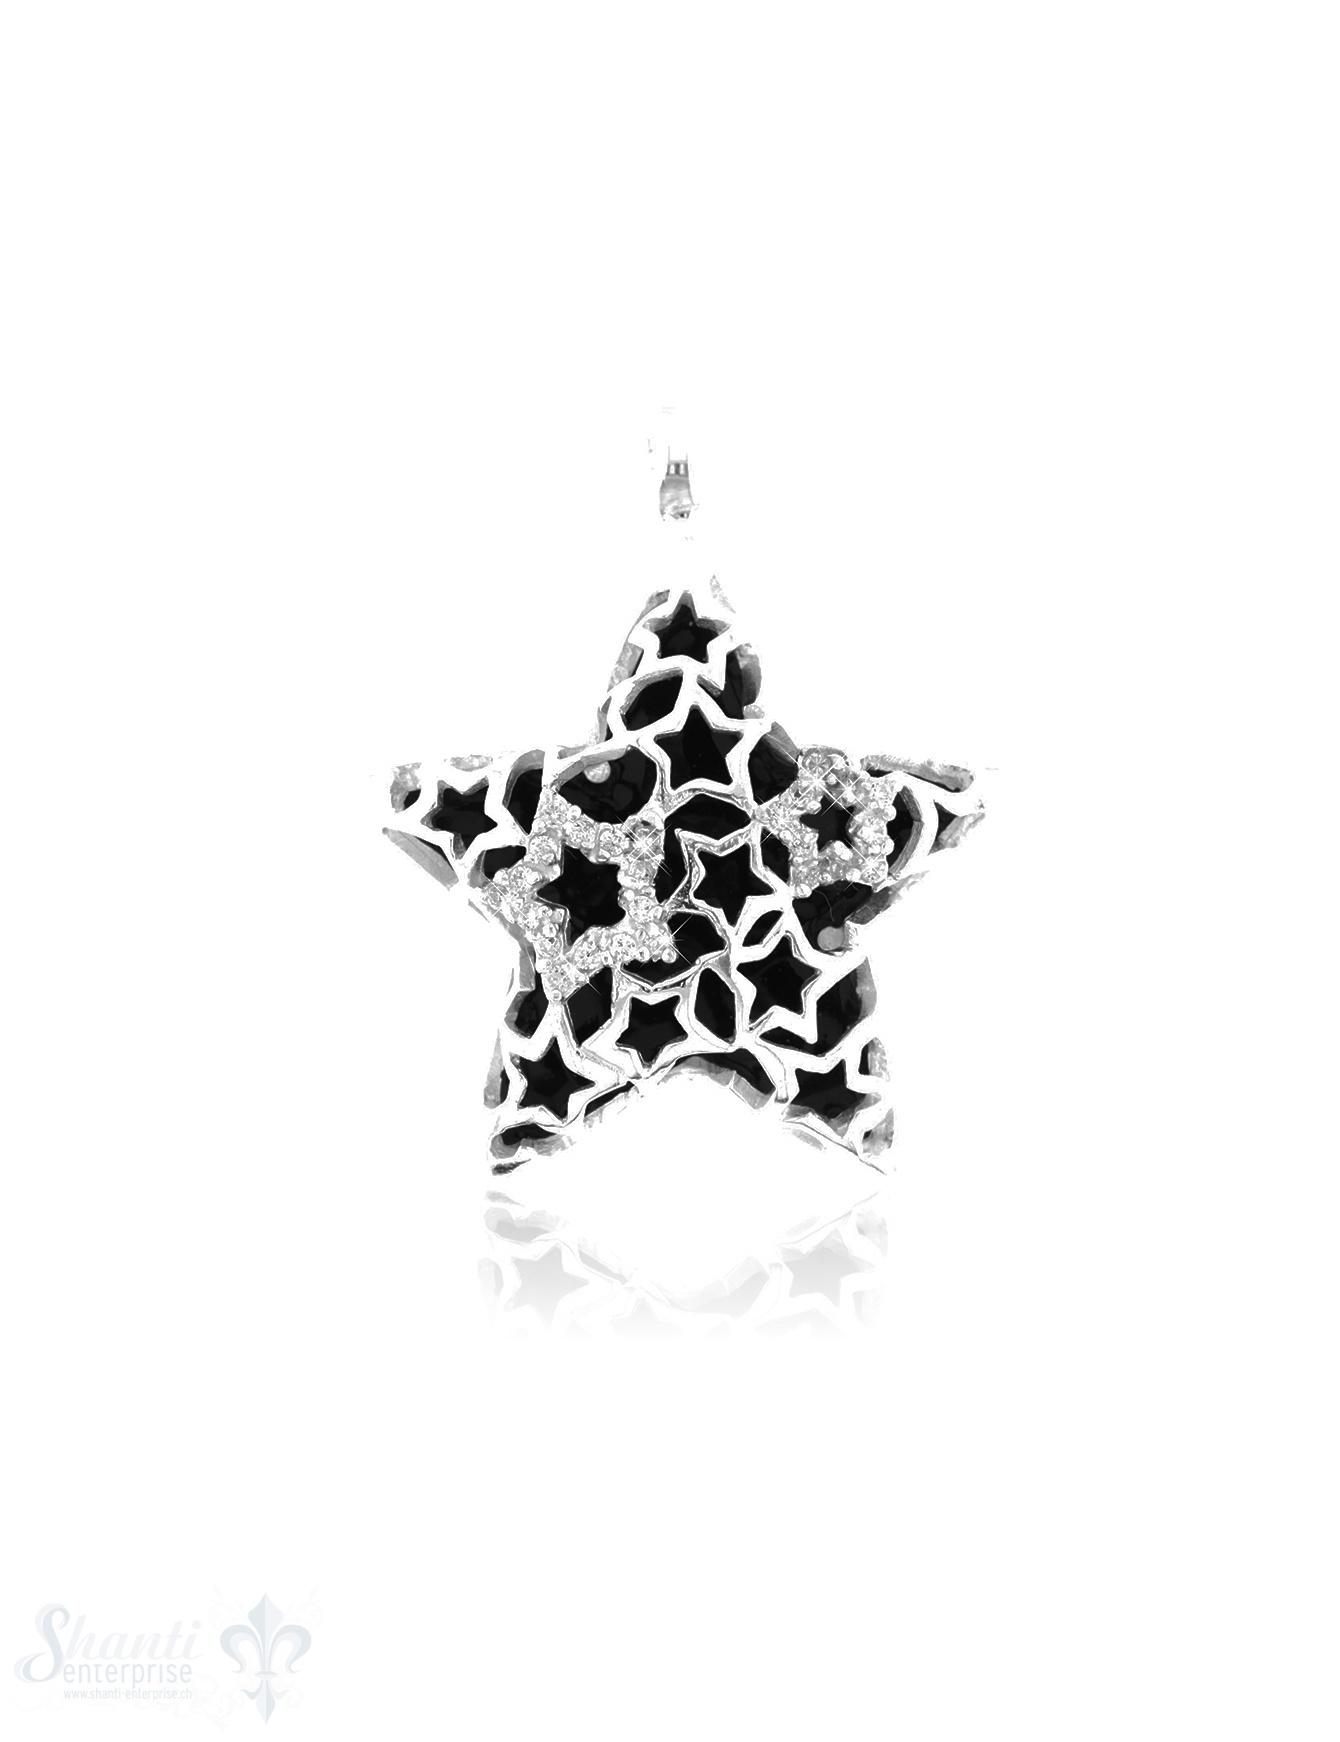 Si-Anhänger: Stern mit Zirkonia D: 35 mm Dicke: 10 mm